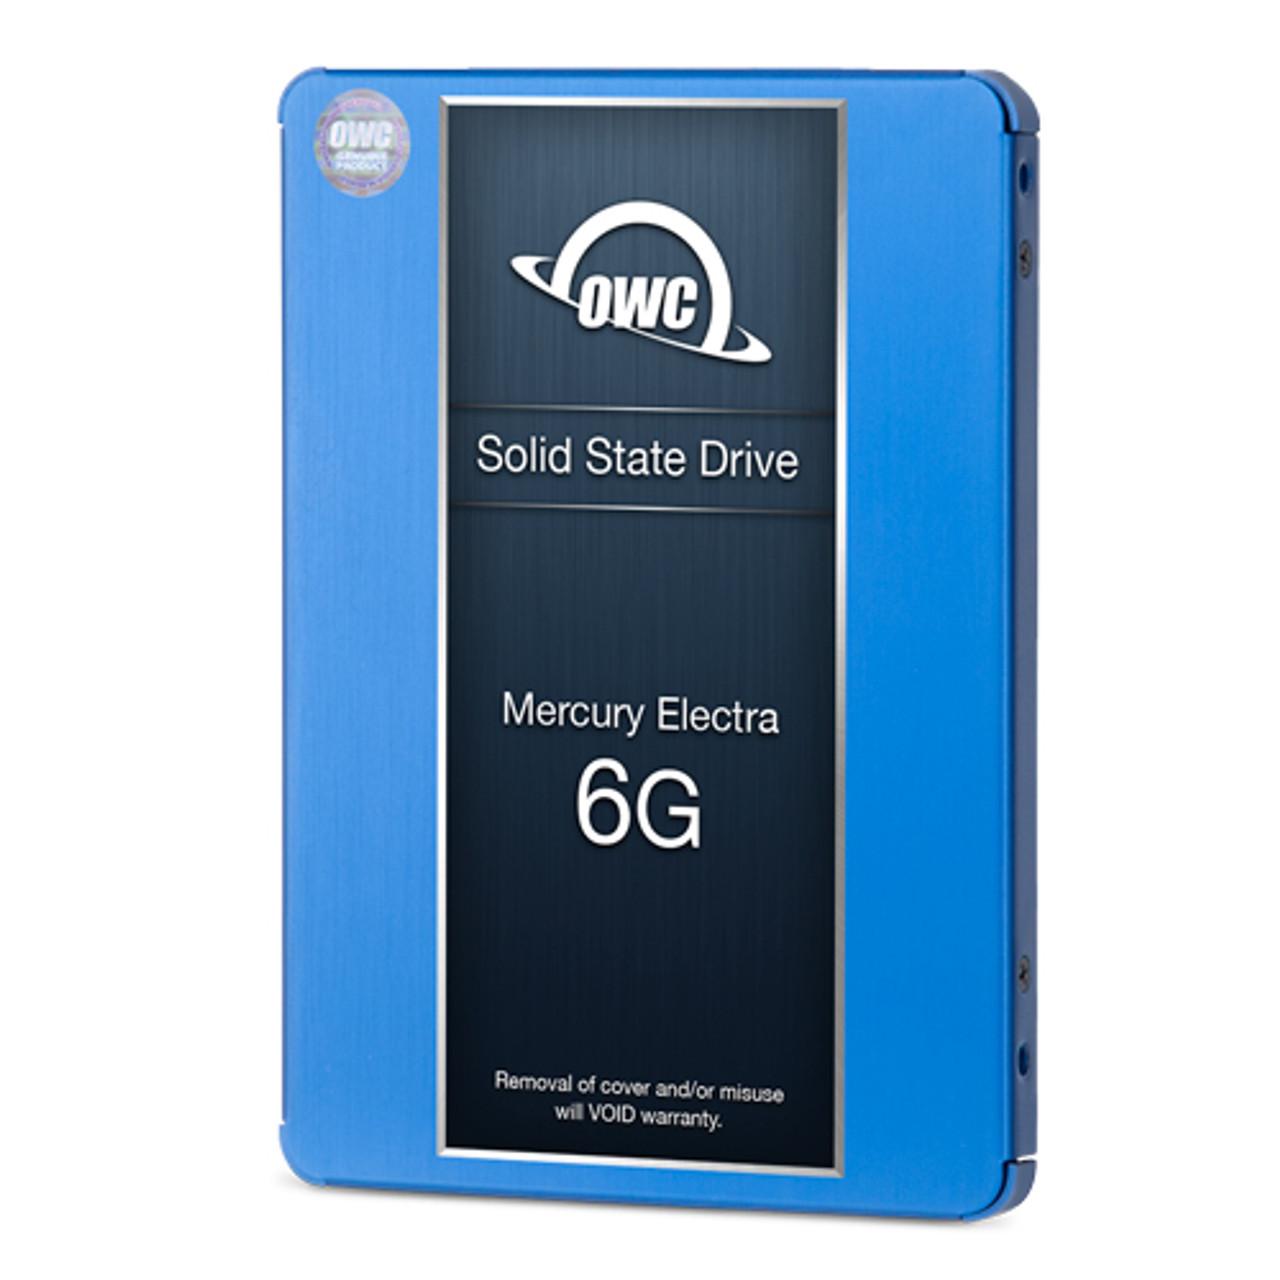 2TB OWC Mercury Electra 6G SSD - SSD Bay Add-In Kit for 2011 27-inch iMacs